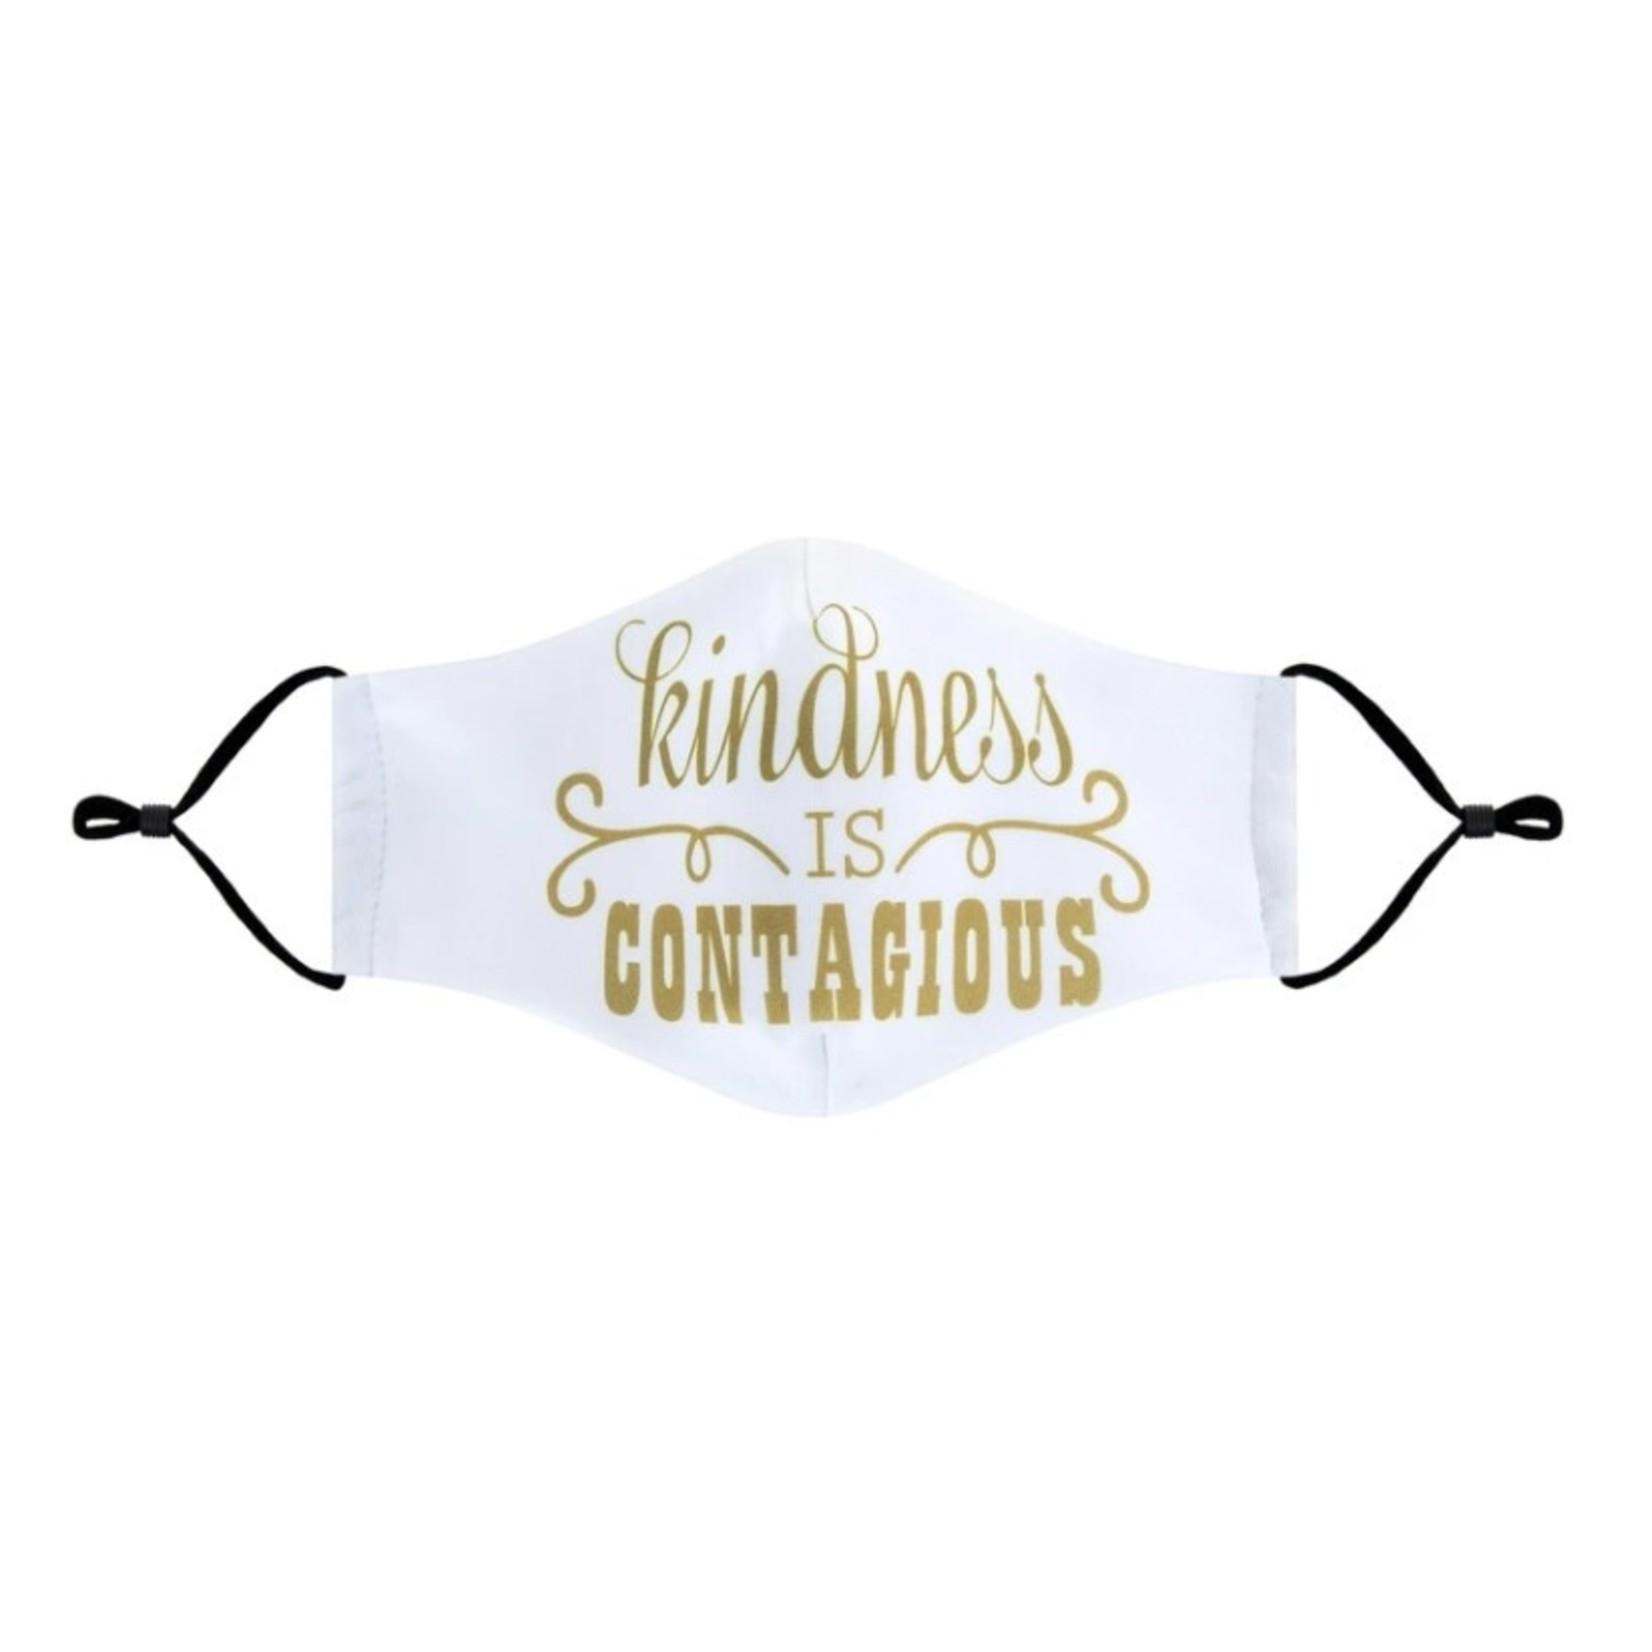 Kindness cloth mask